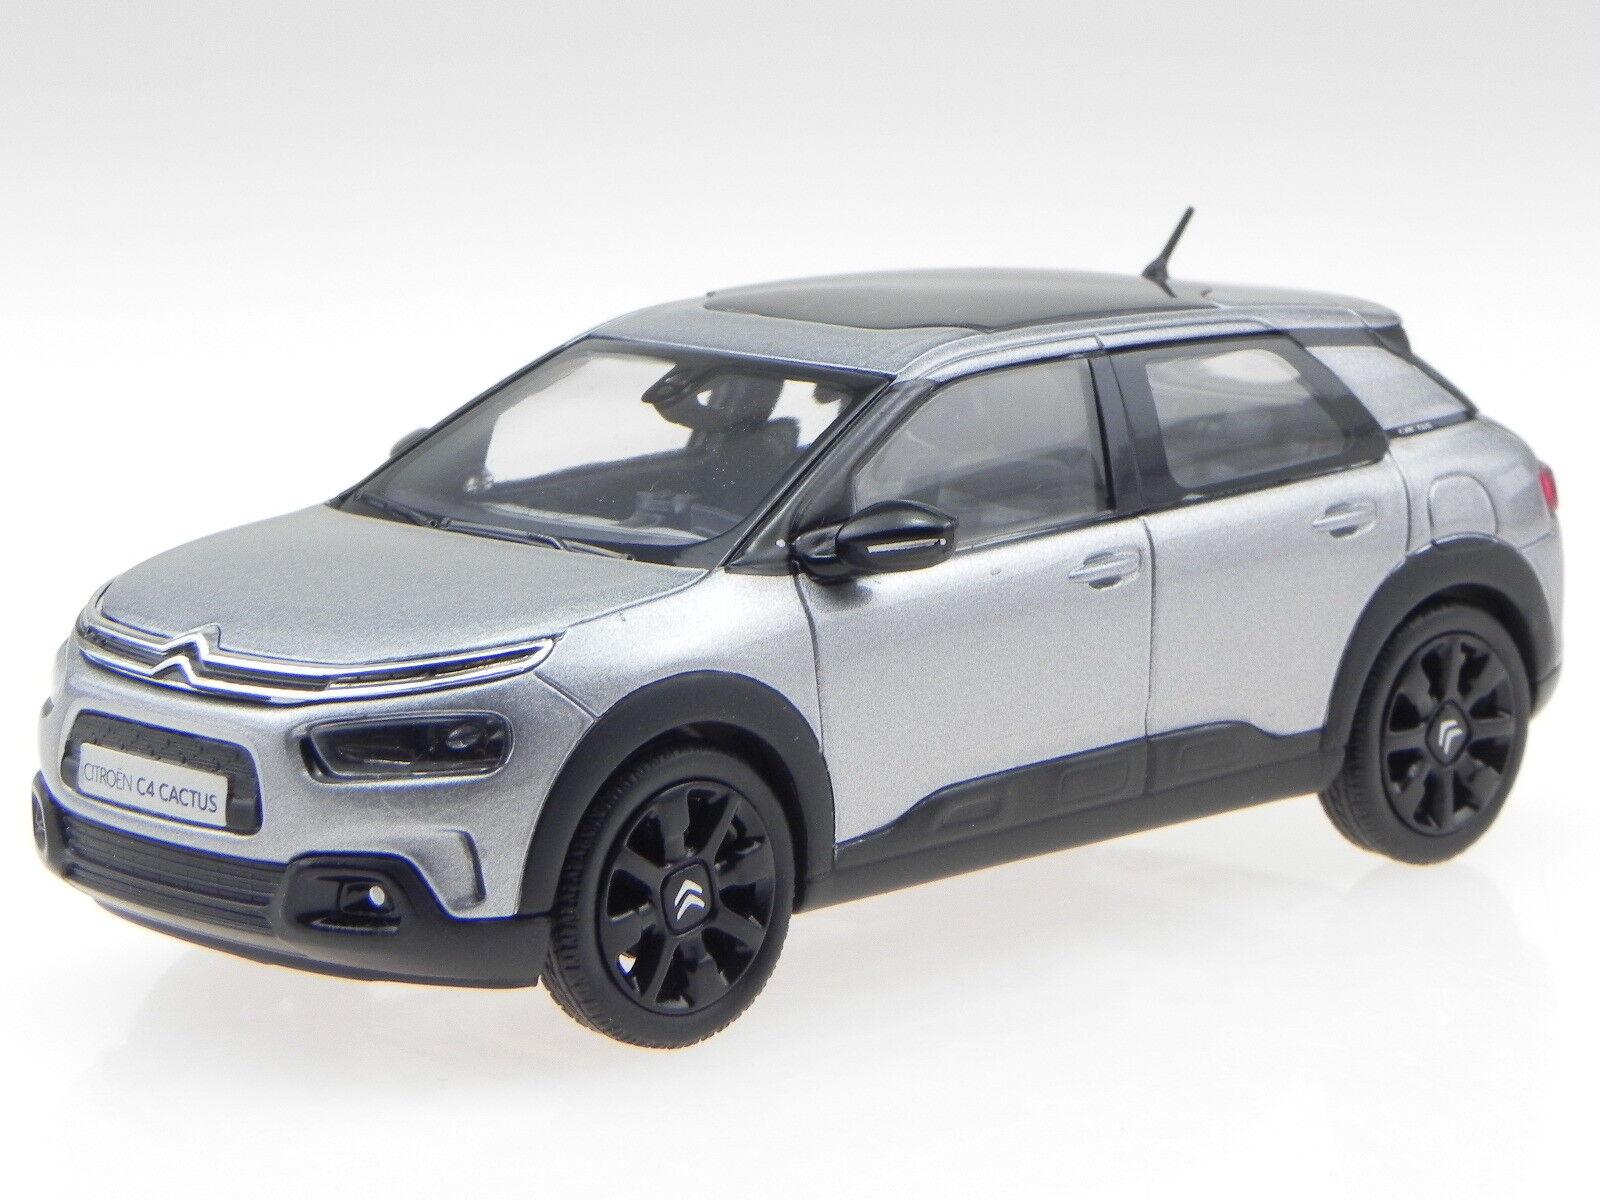 Citroen C4 Cactus 2018 grau Deko schwarz Modellauto 155476 Norev 1 43  | Authentische Garantie